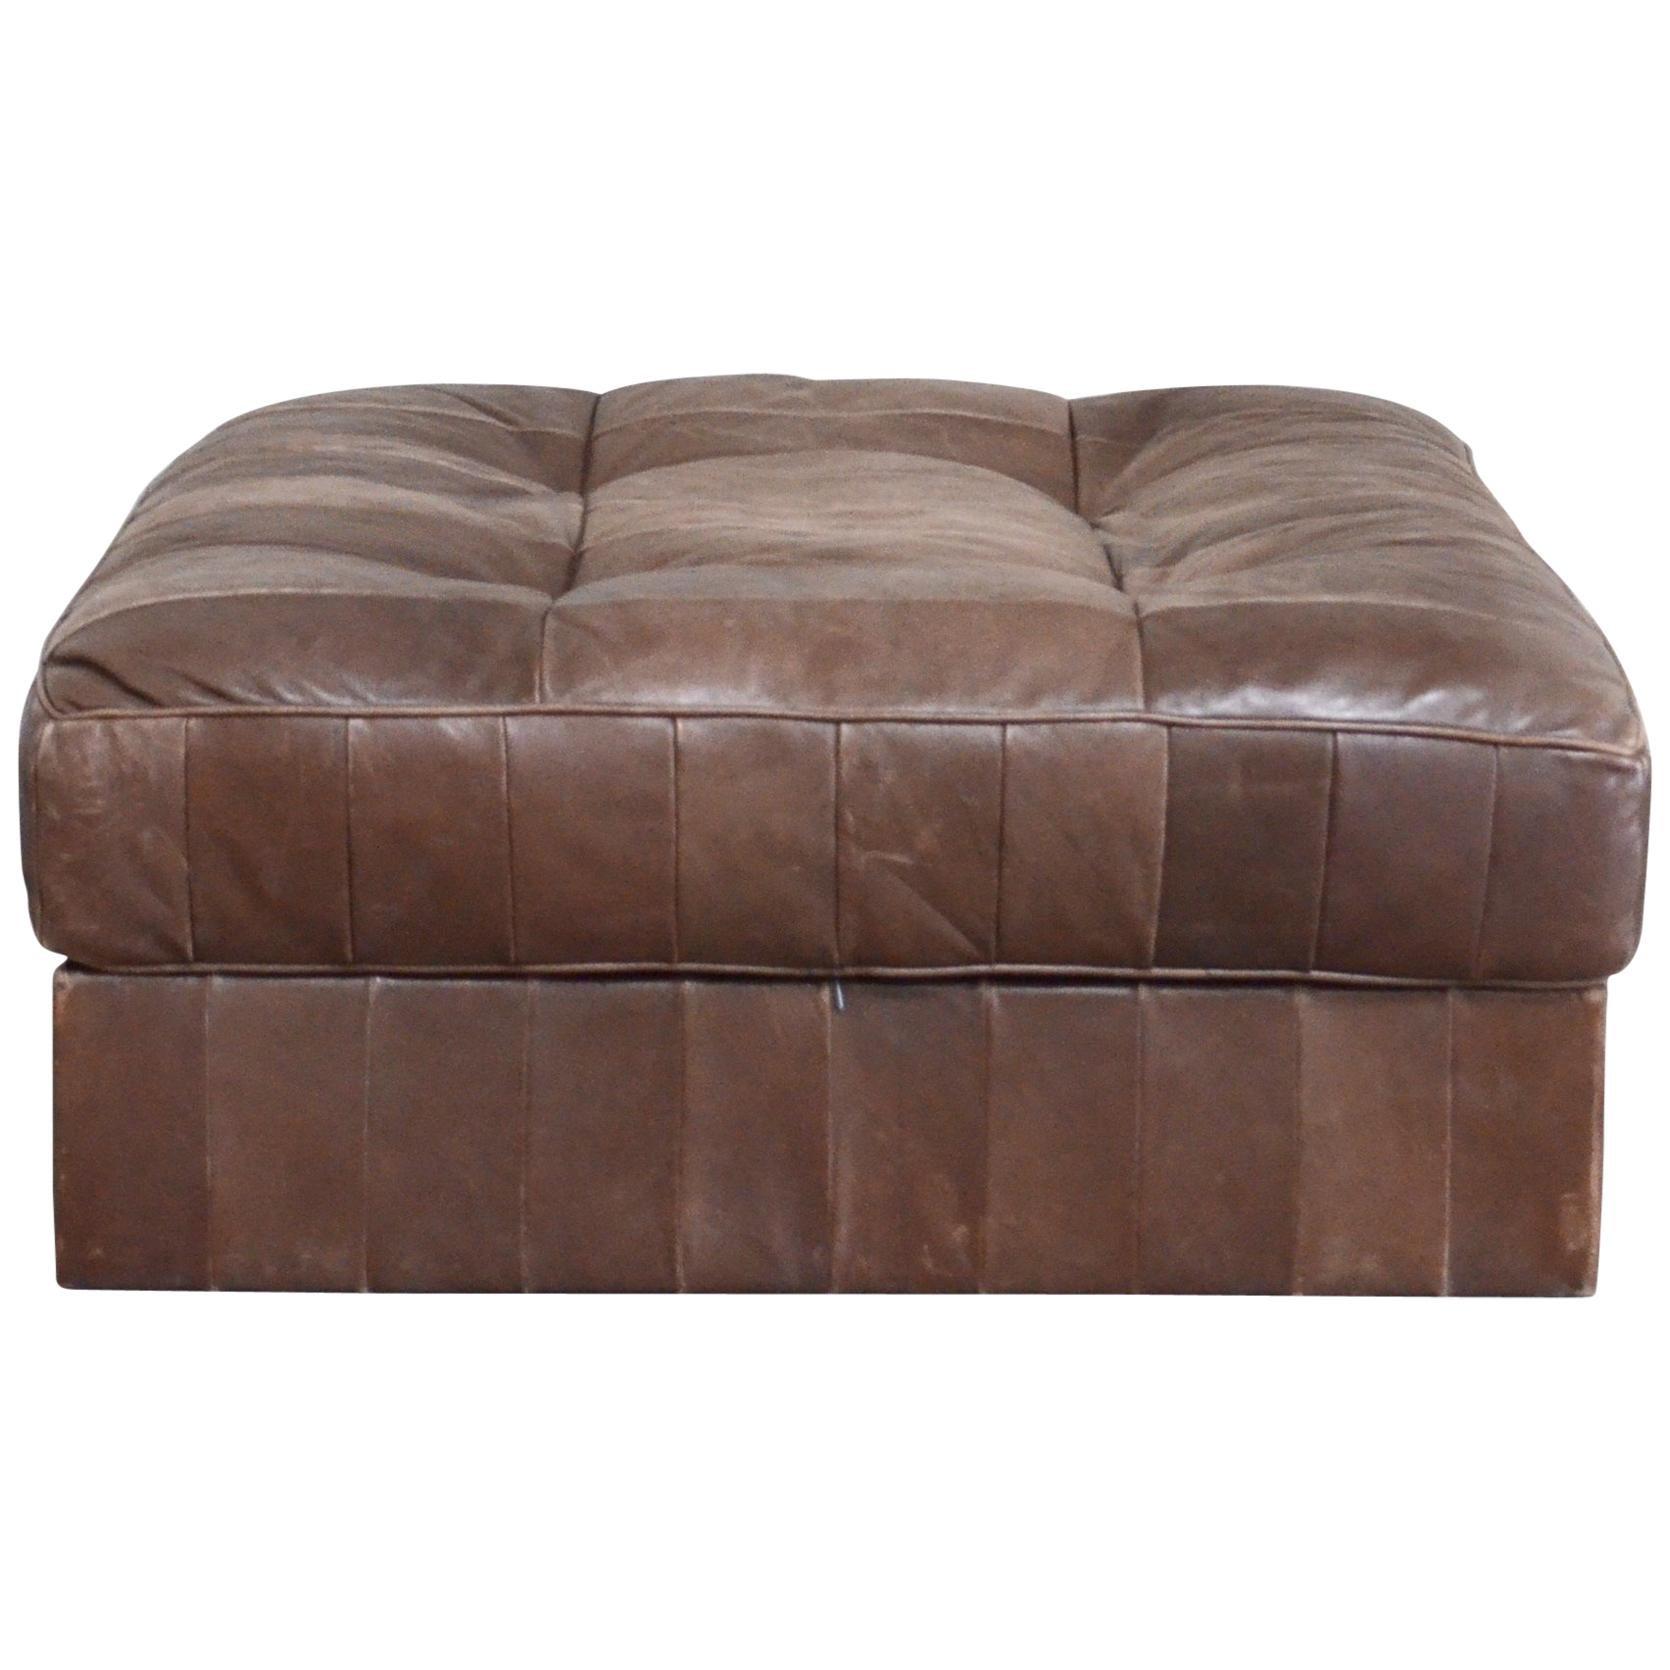 De Sede DS 88 Leather Ottoman or Pouf Patchwork Brown